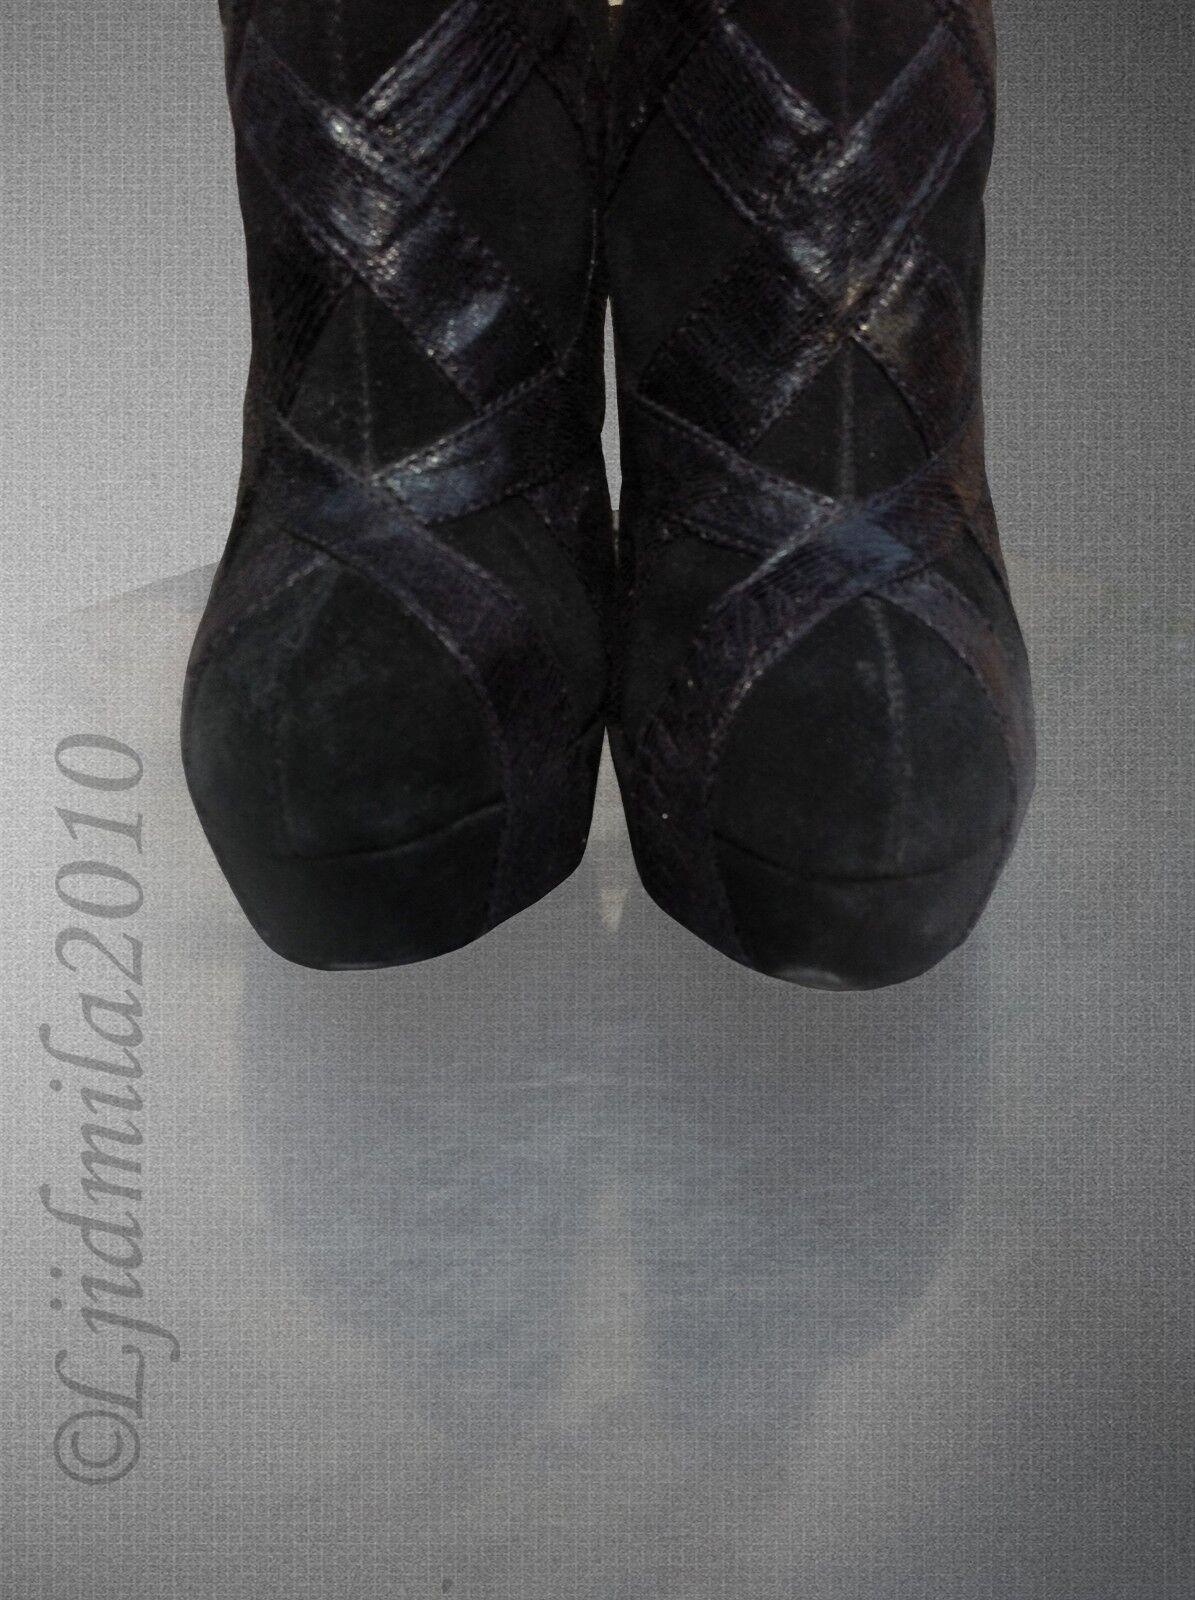 128 Victoria's Victoria's Victoria's Secret C.Stuart Suede Lizard Platform Ankle Stiefelie Heels 8,5 US 0a3c6f